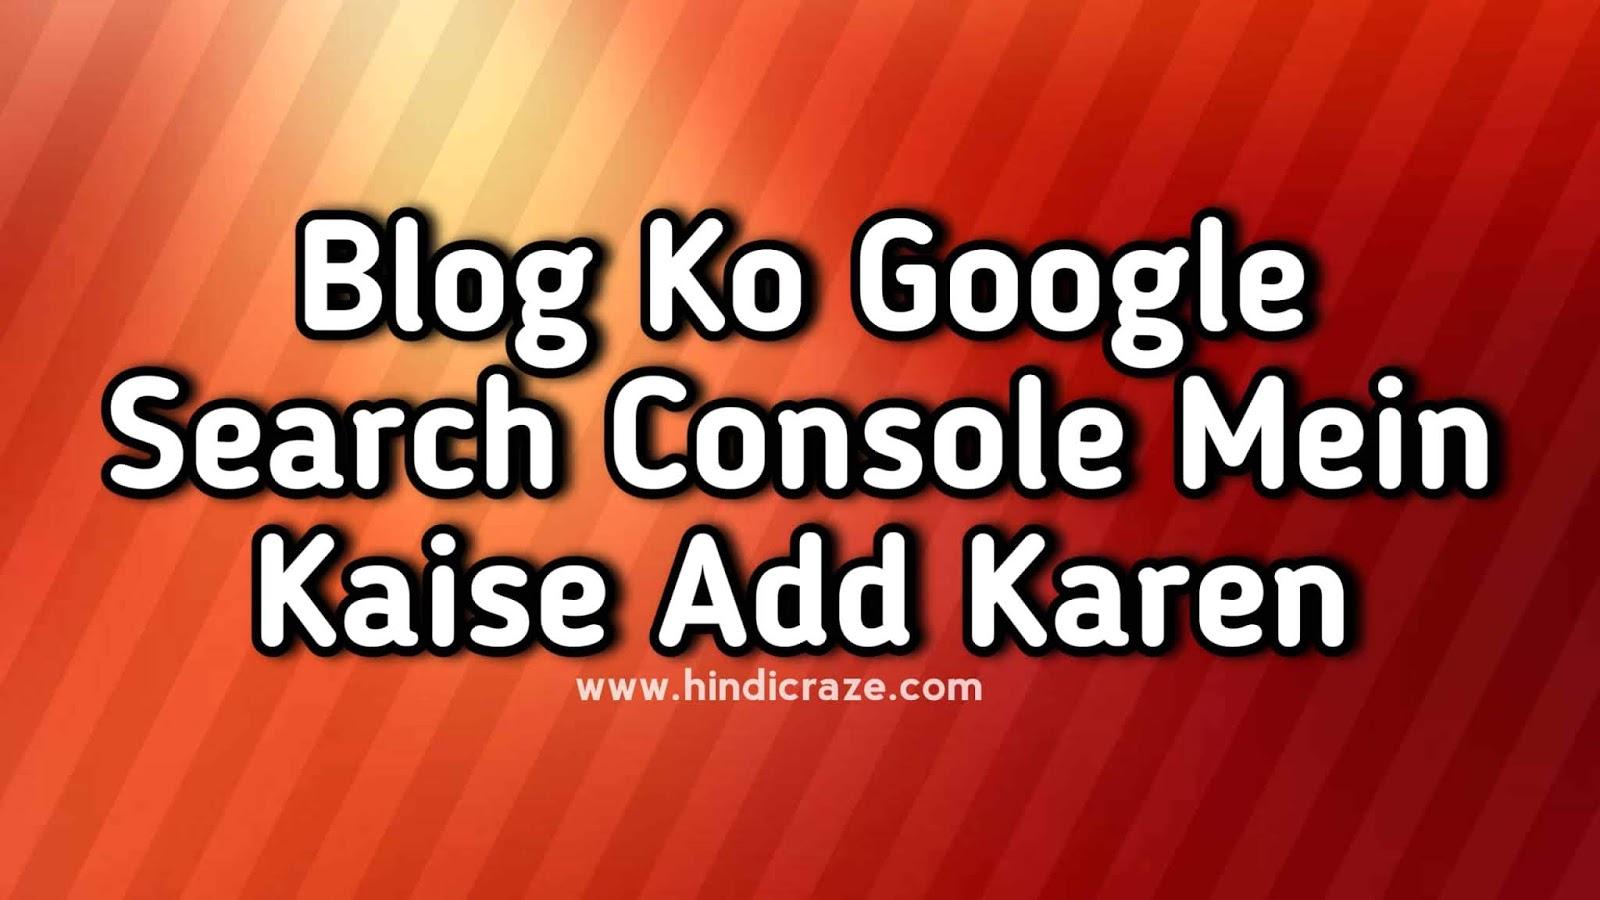 Blogger Blog Ko Delete Kaise Kare Hindi Me - HindiCraze